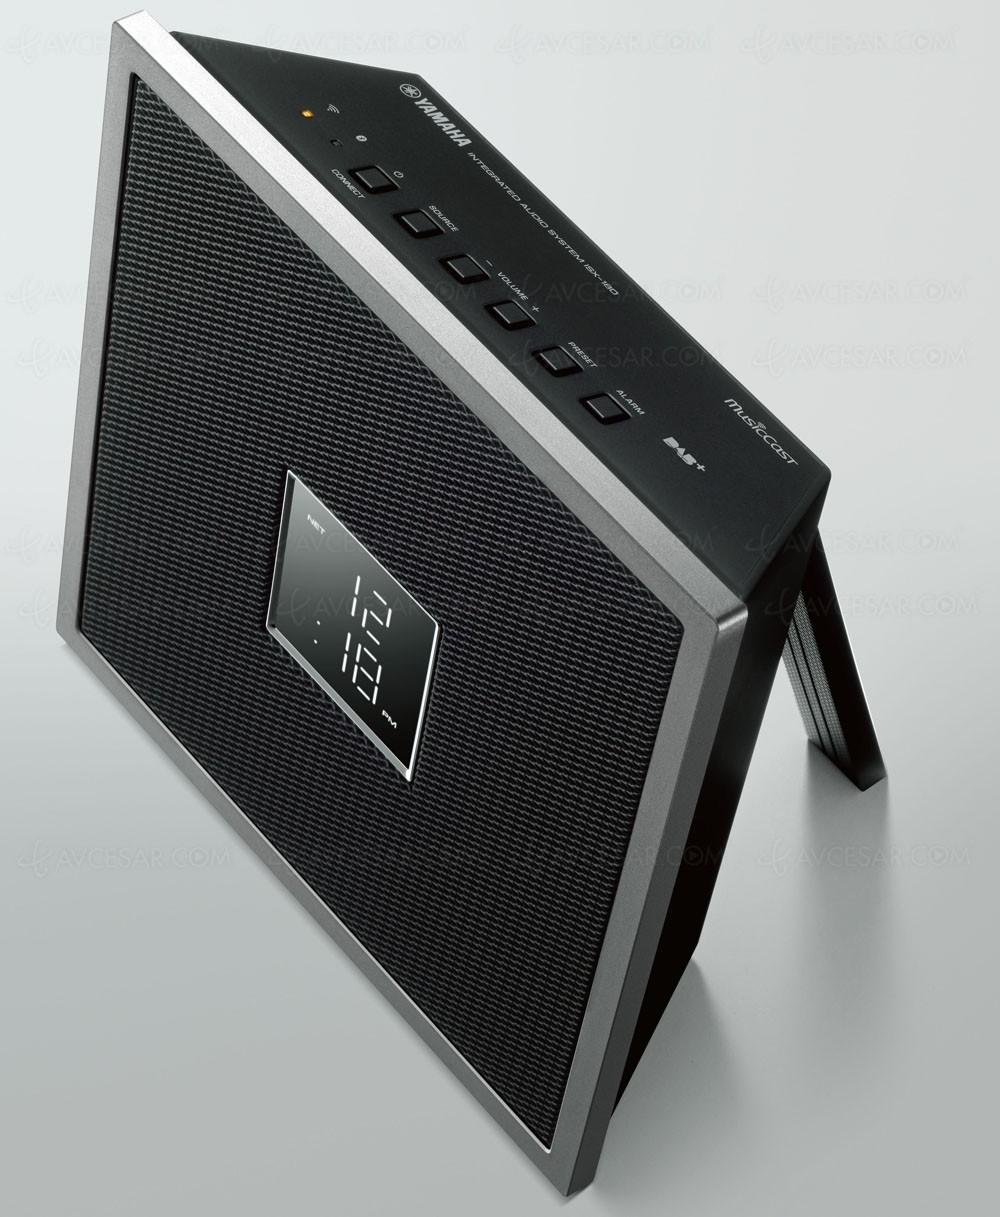 yamaha restio isx 18d dernier n de la famille multiroom. Black Bedroom Furniture Sets. Home Design Ideas